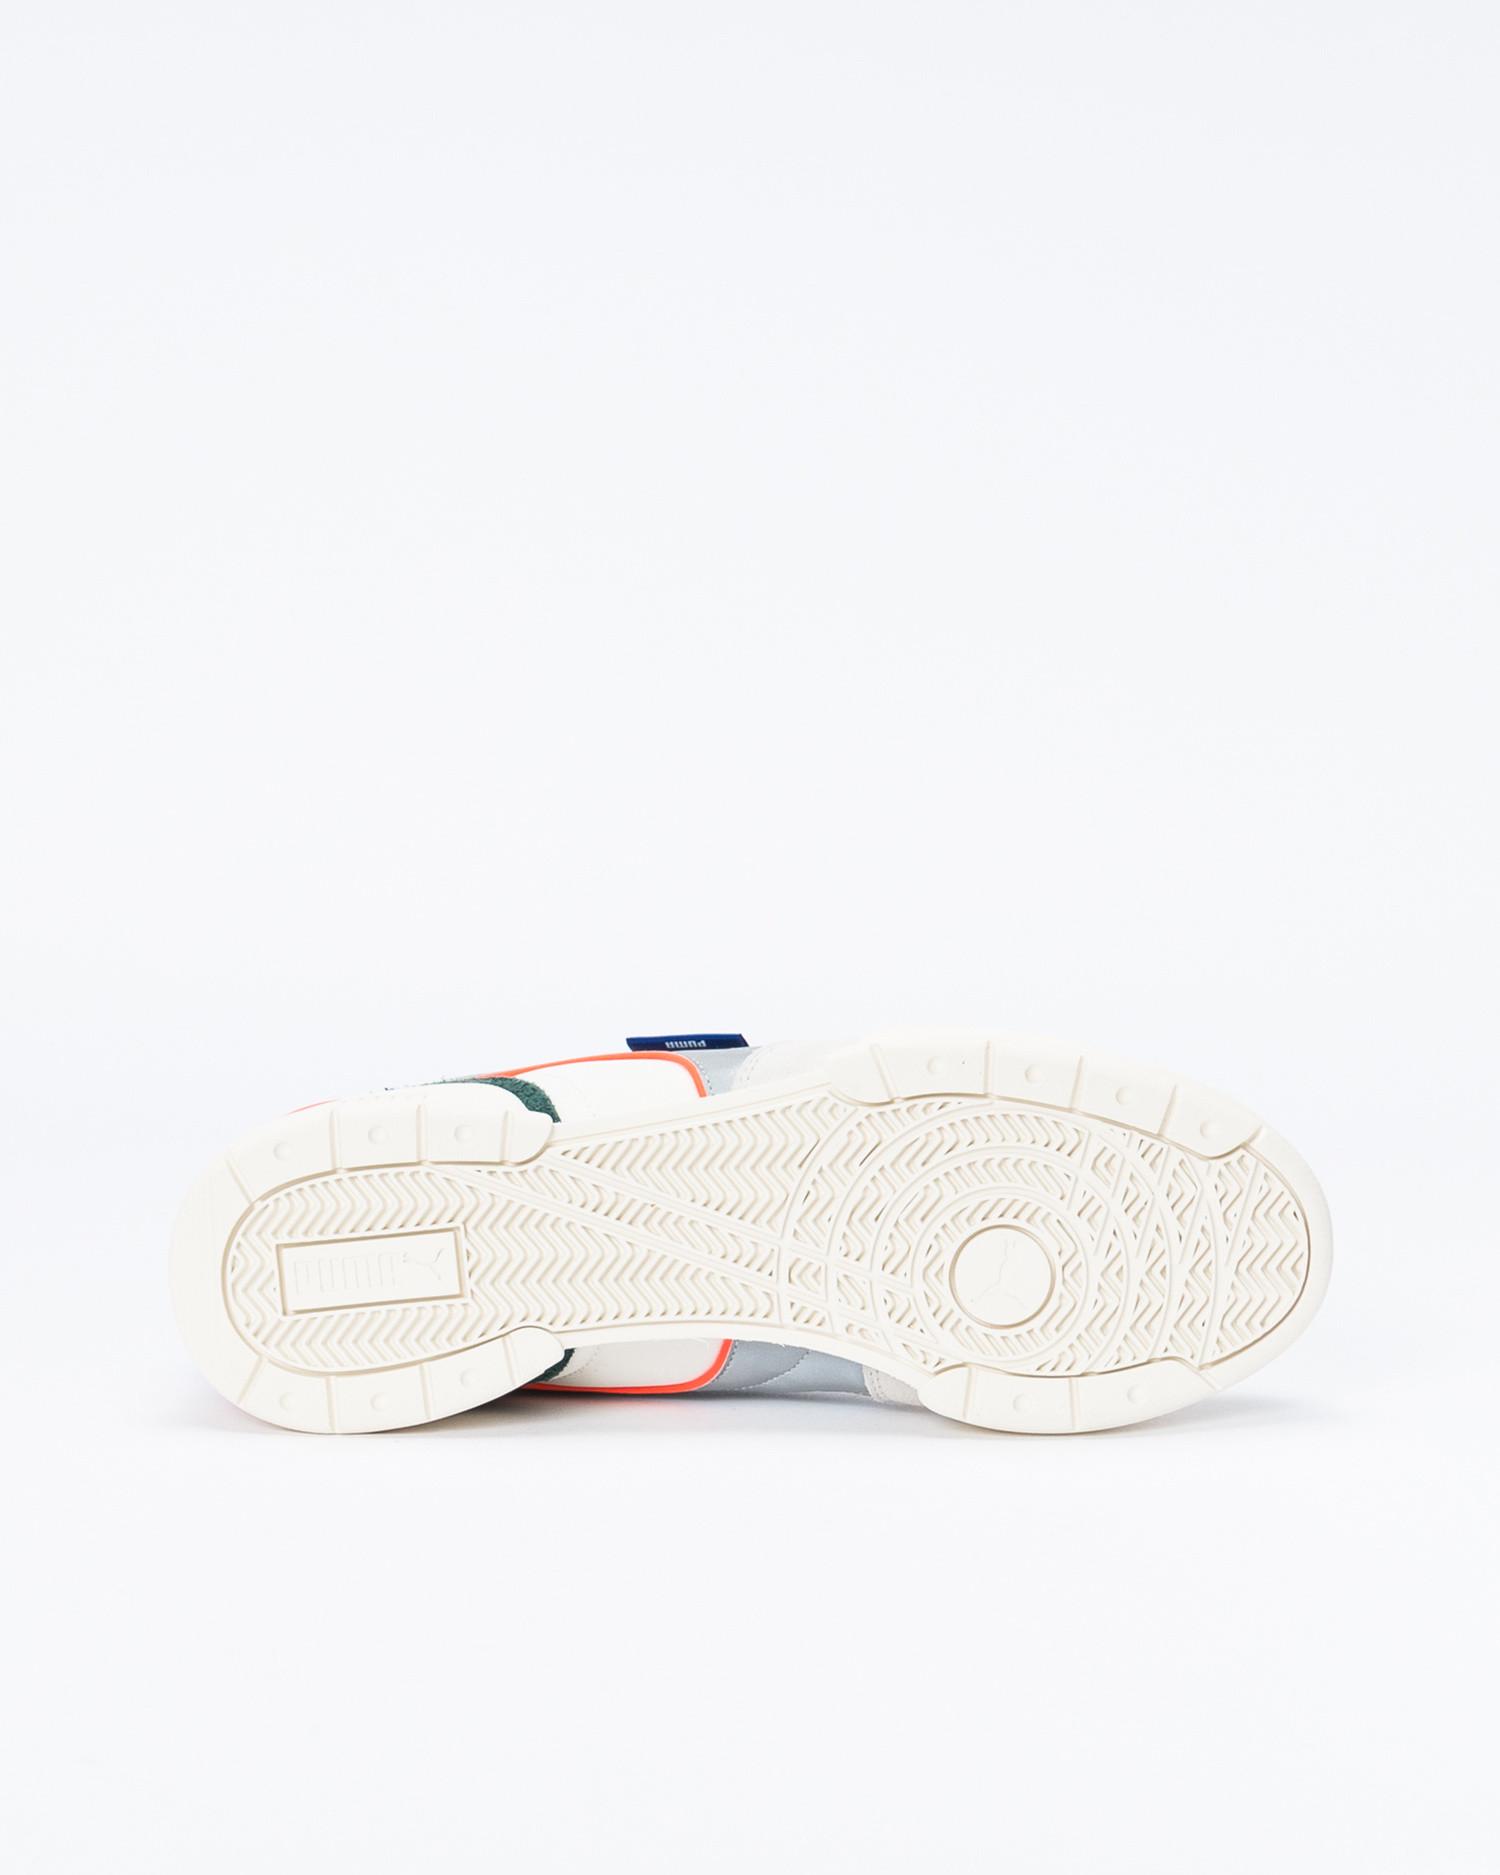 Puma CGR x Ader Error White/Surf the web